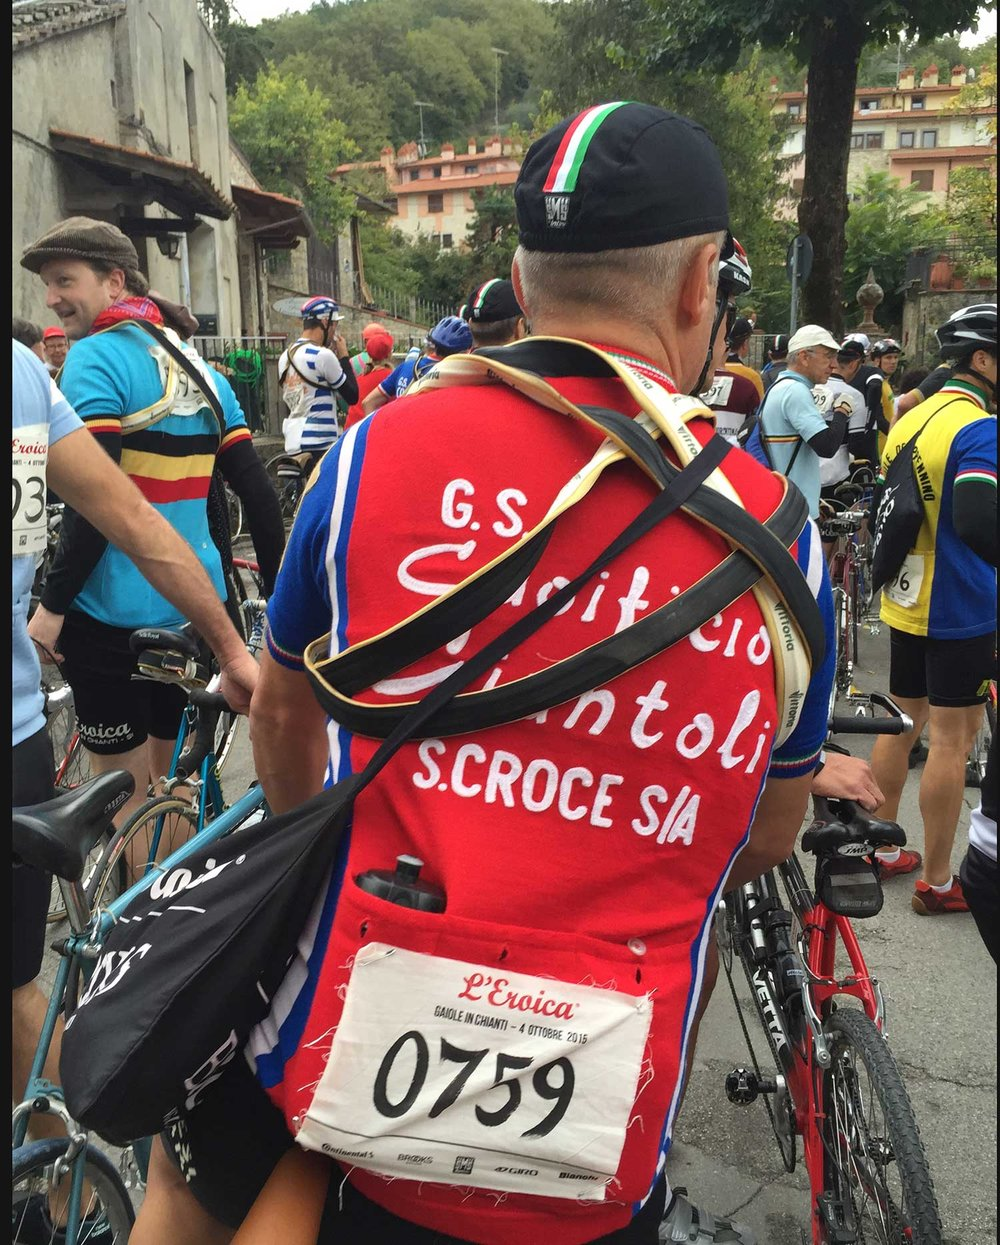 ron-miriello-grafico-san-diego-officina-eroica-vintage-cycling-jersey-maglia-bici-branding-10.jpg